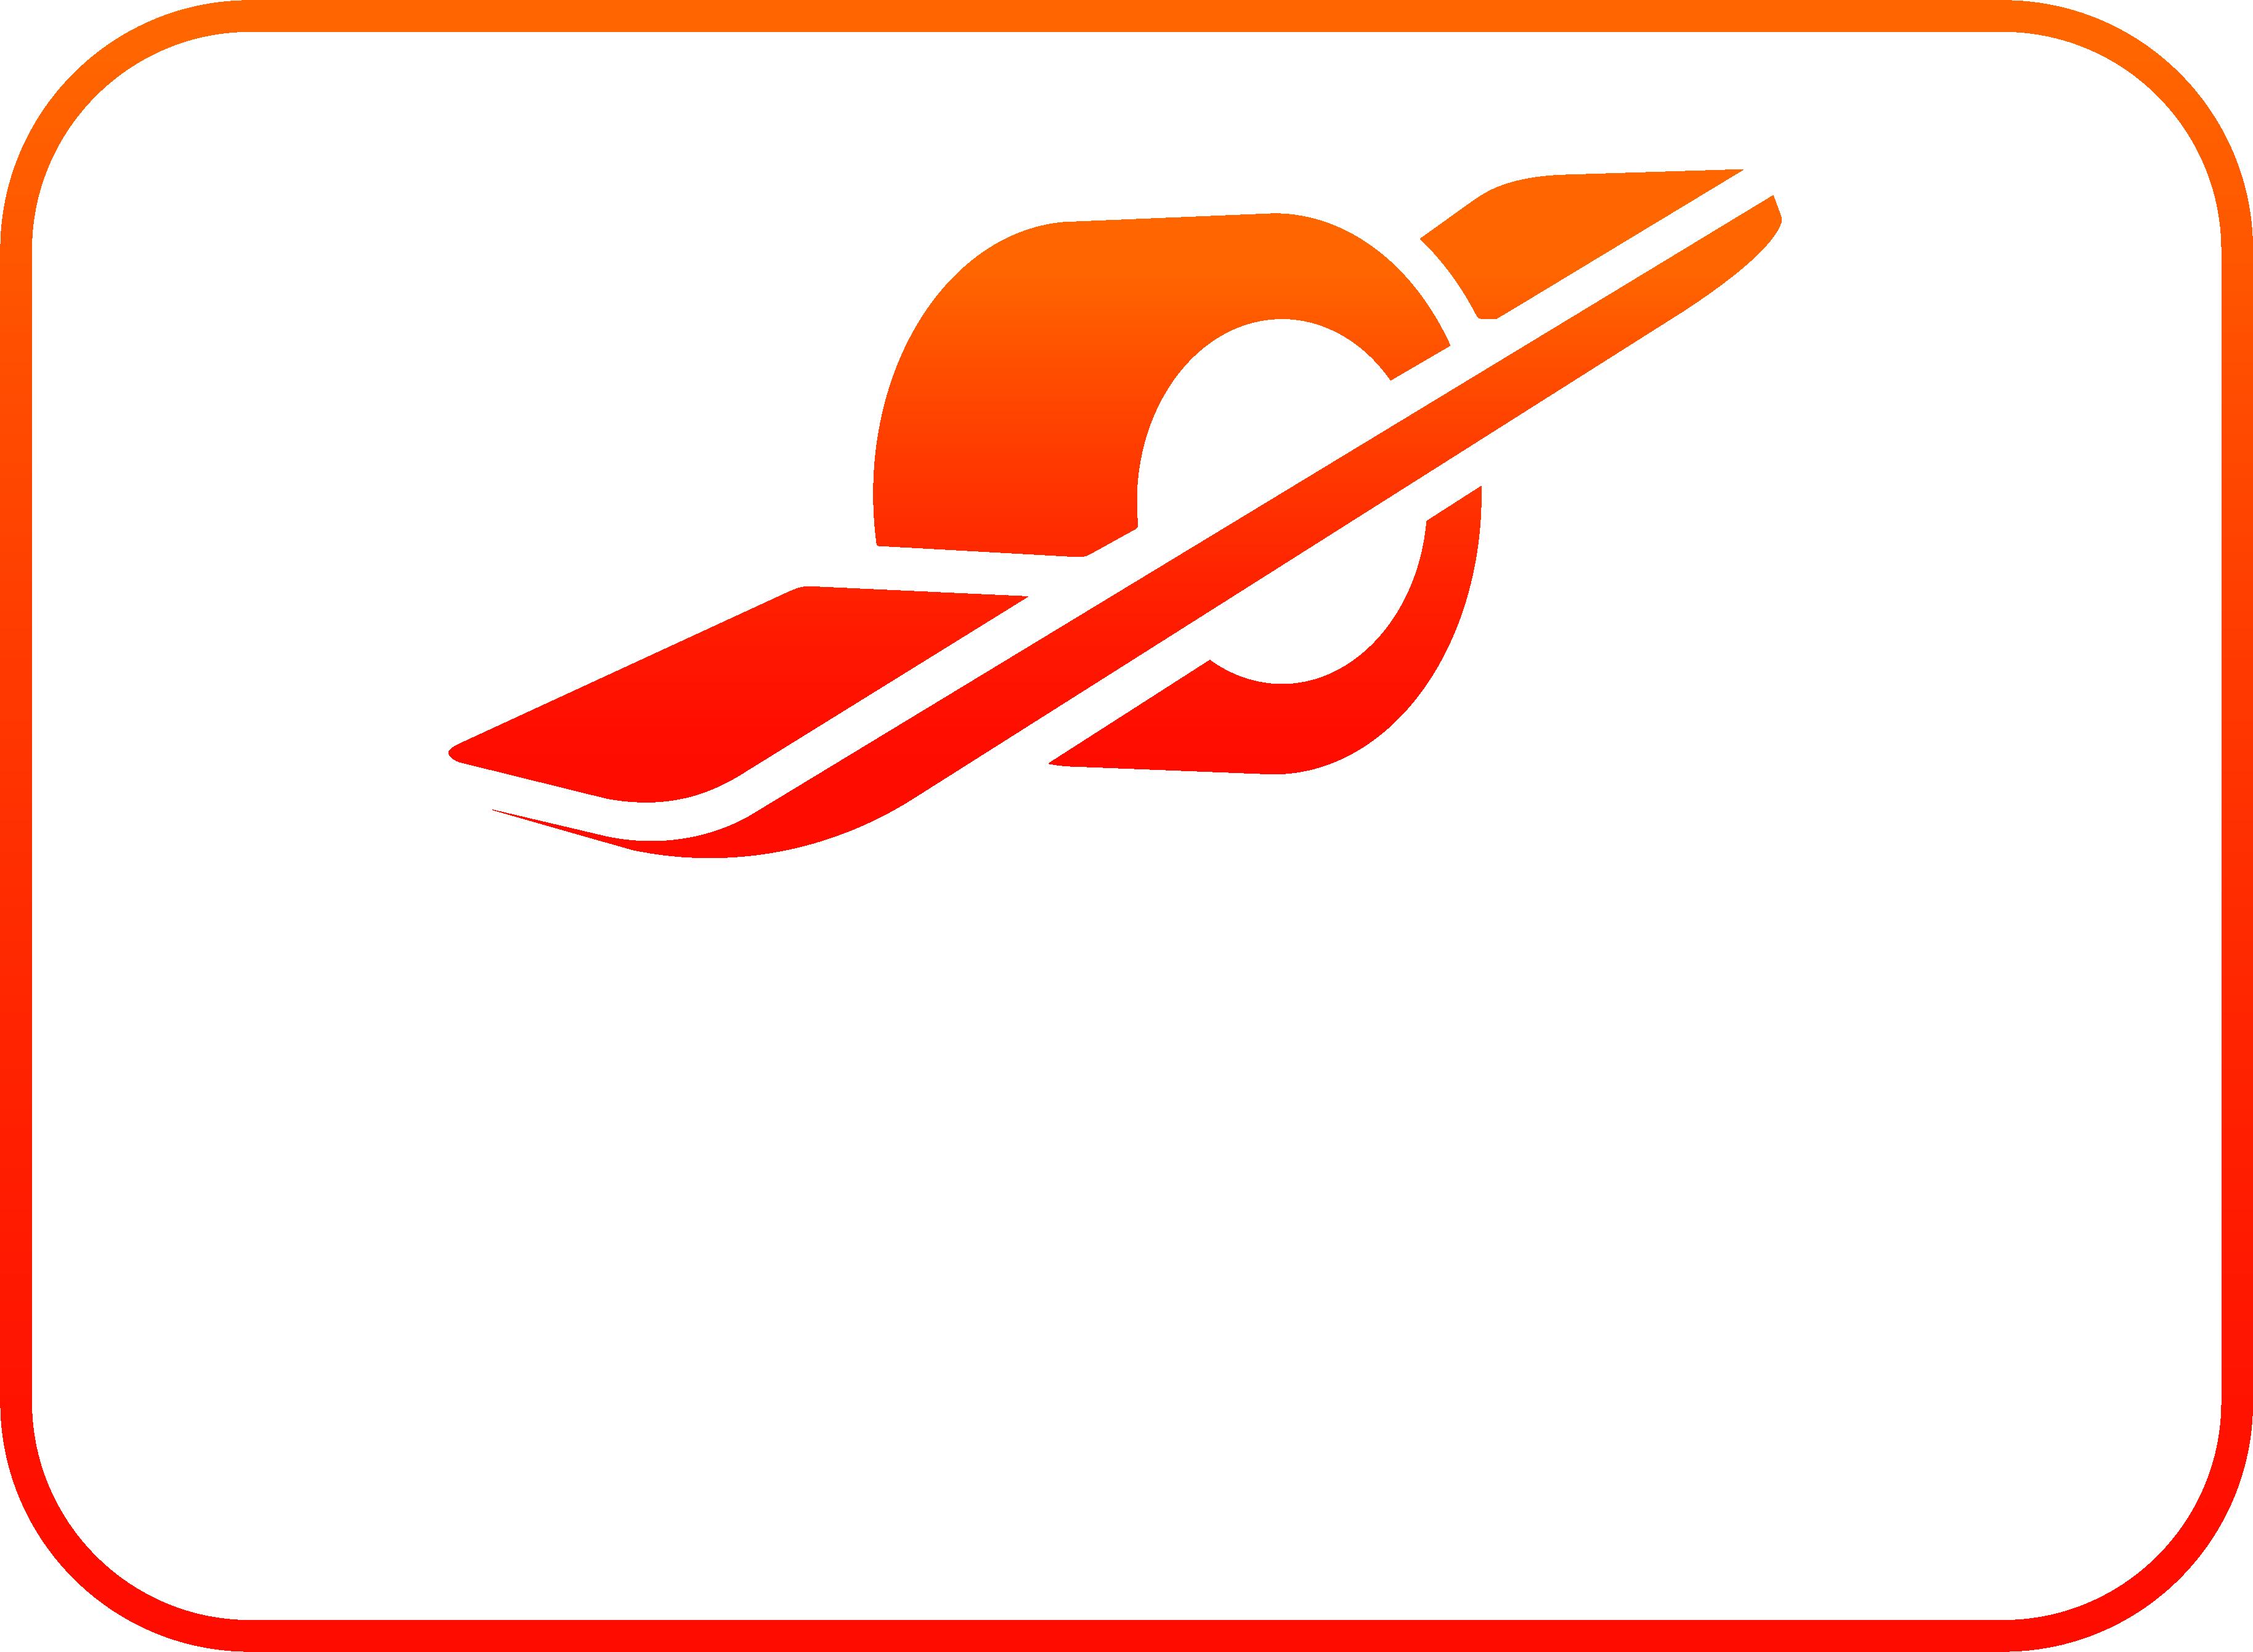 XR PLUS CONCAVE TRACTION PADS 2-05